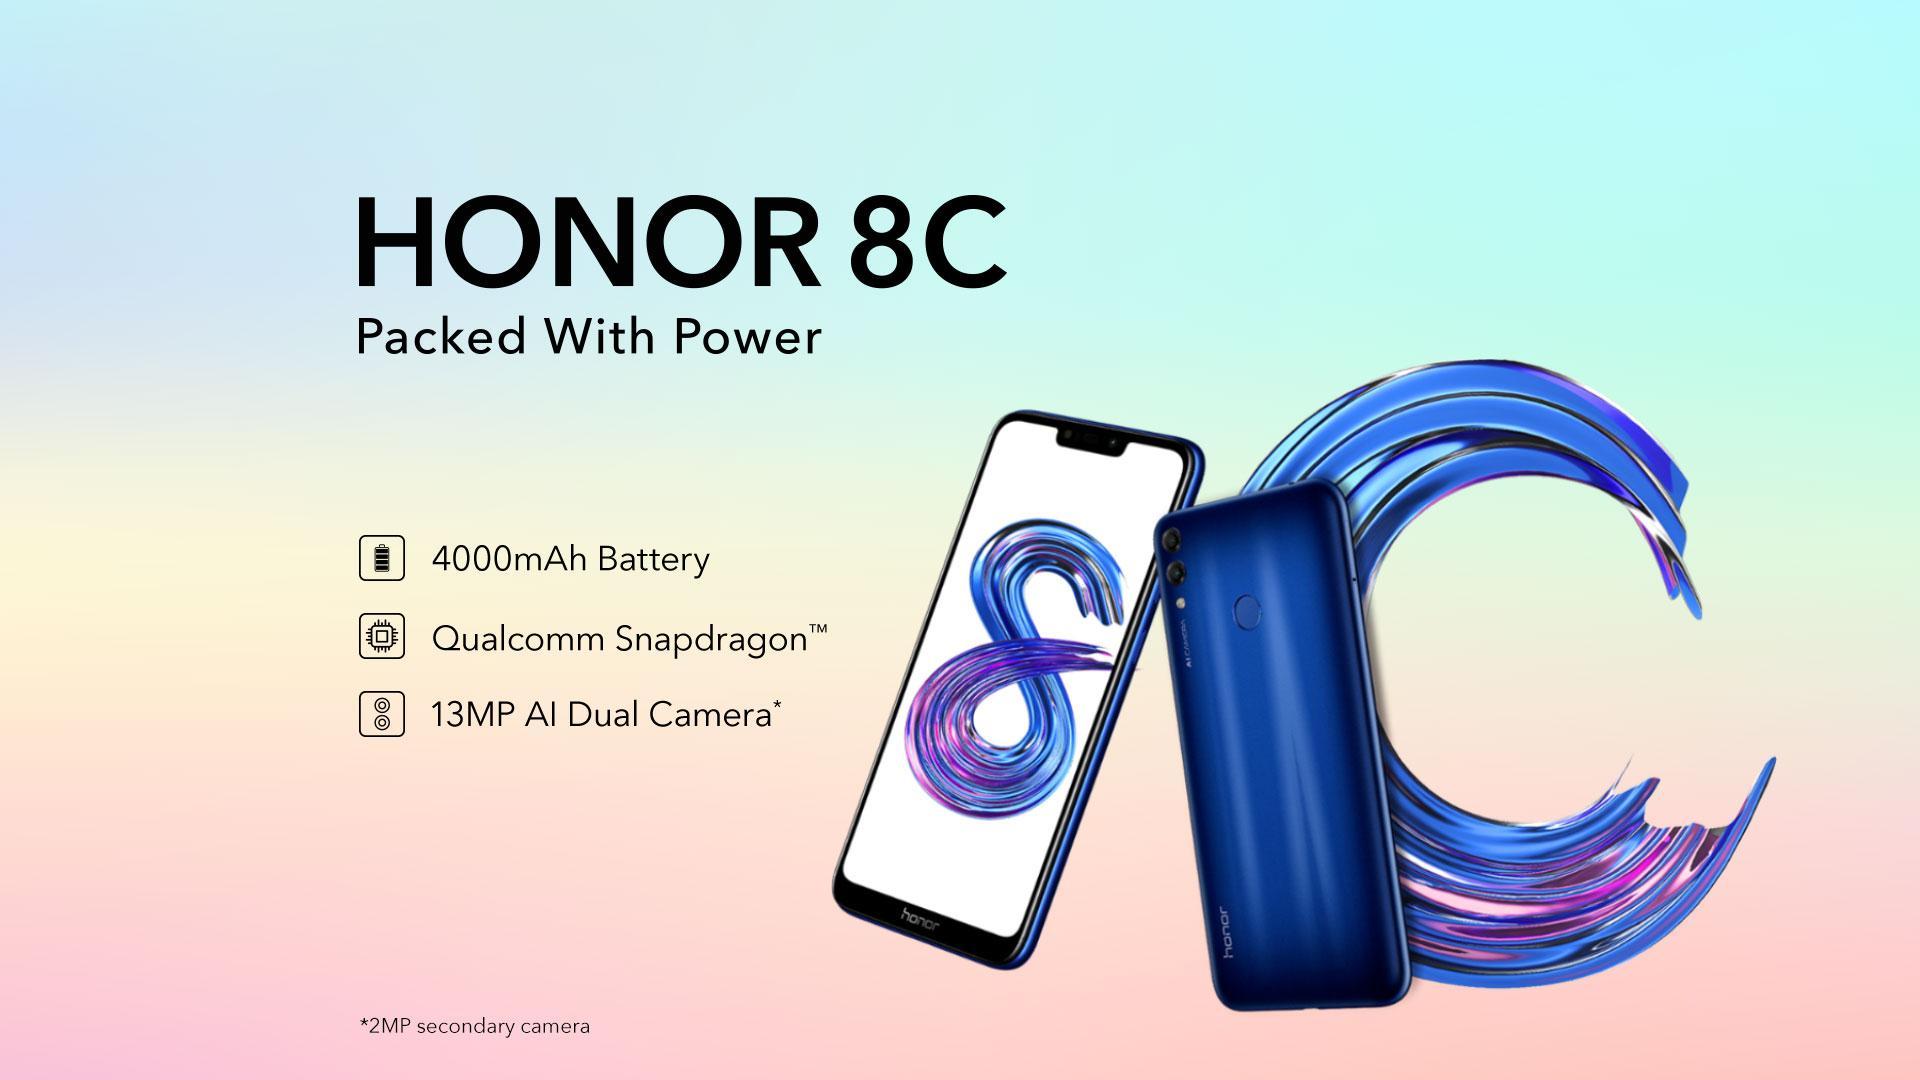 Honor 8C Qualcomm Snapdragon 632